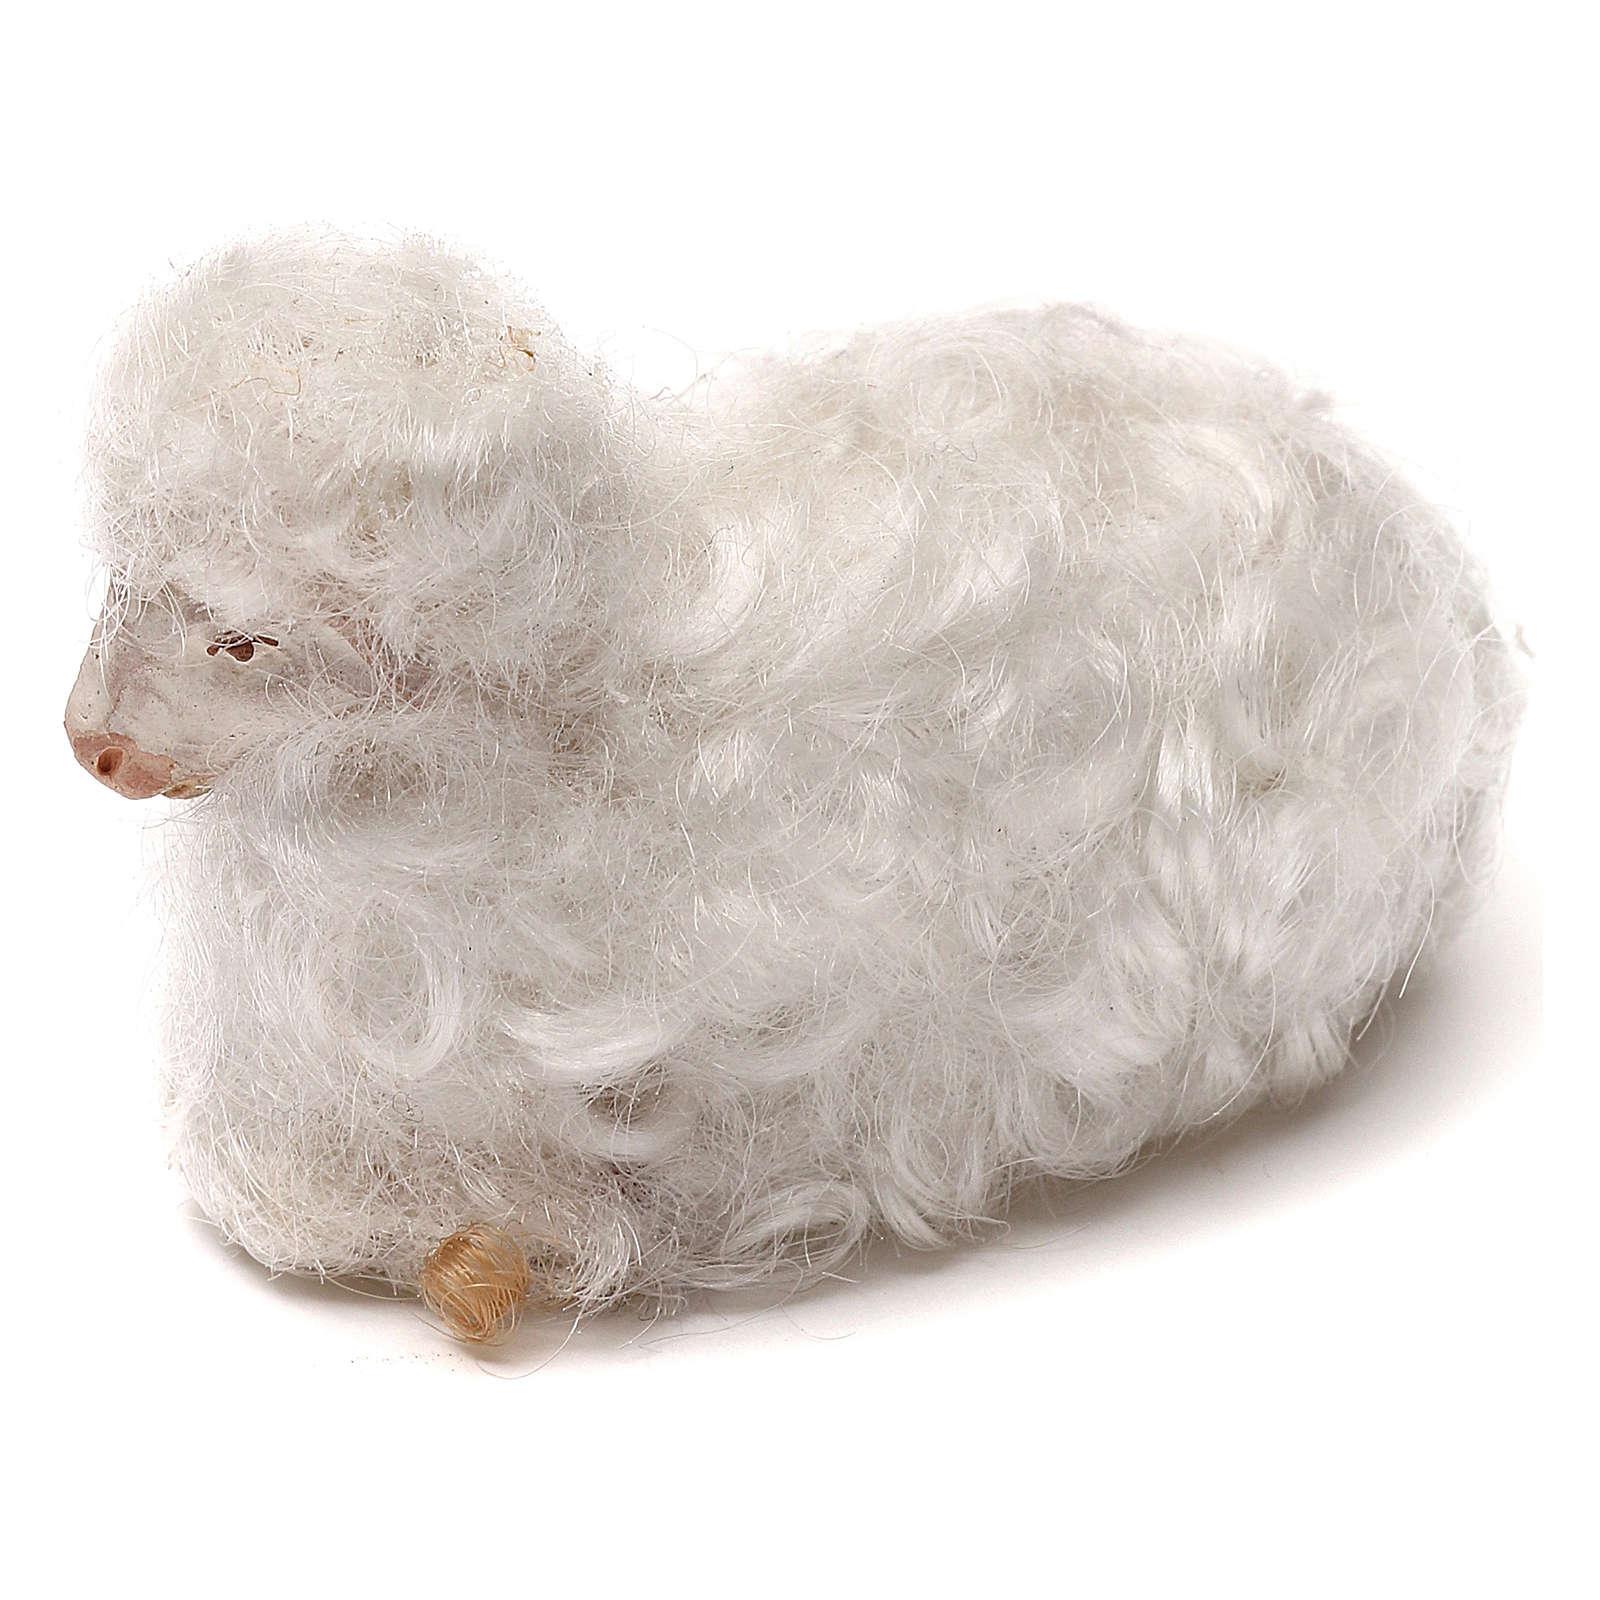 STOCK Pecora lana bianca presepe napoletano 14 cm 4